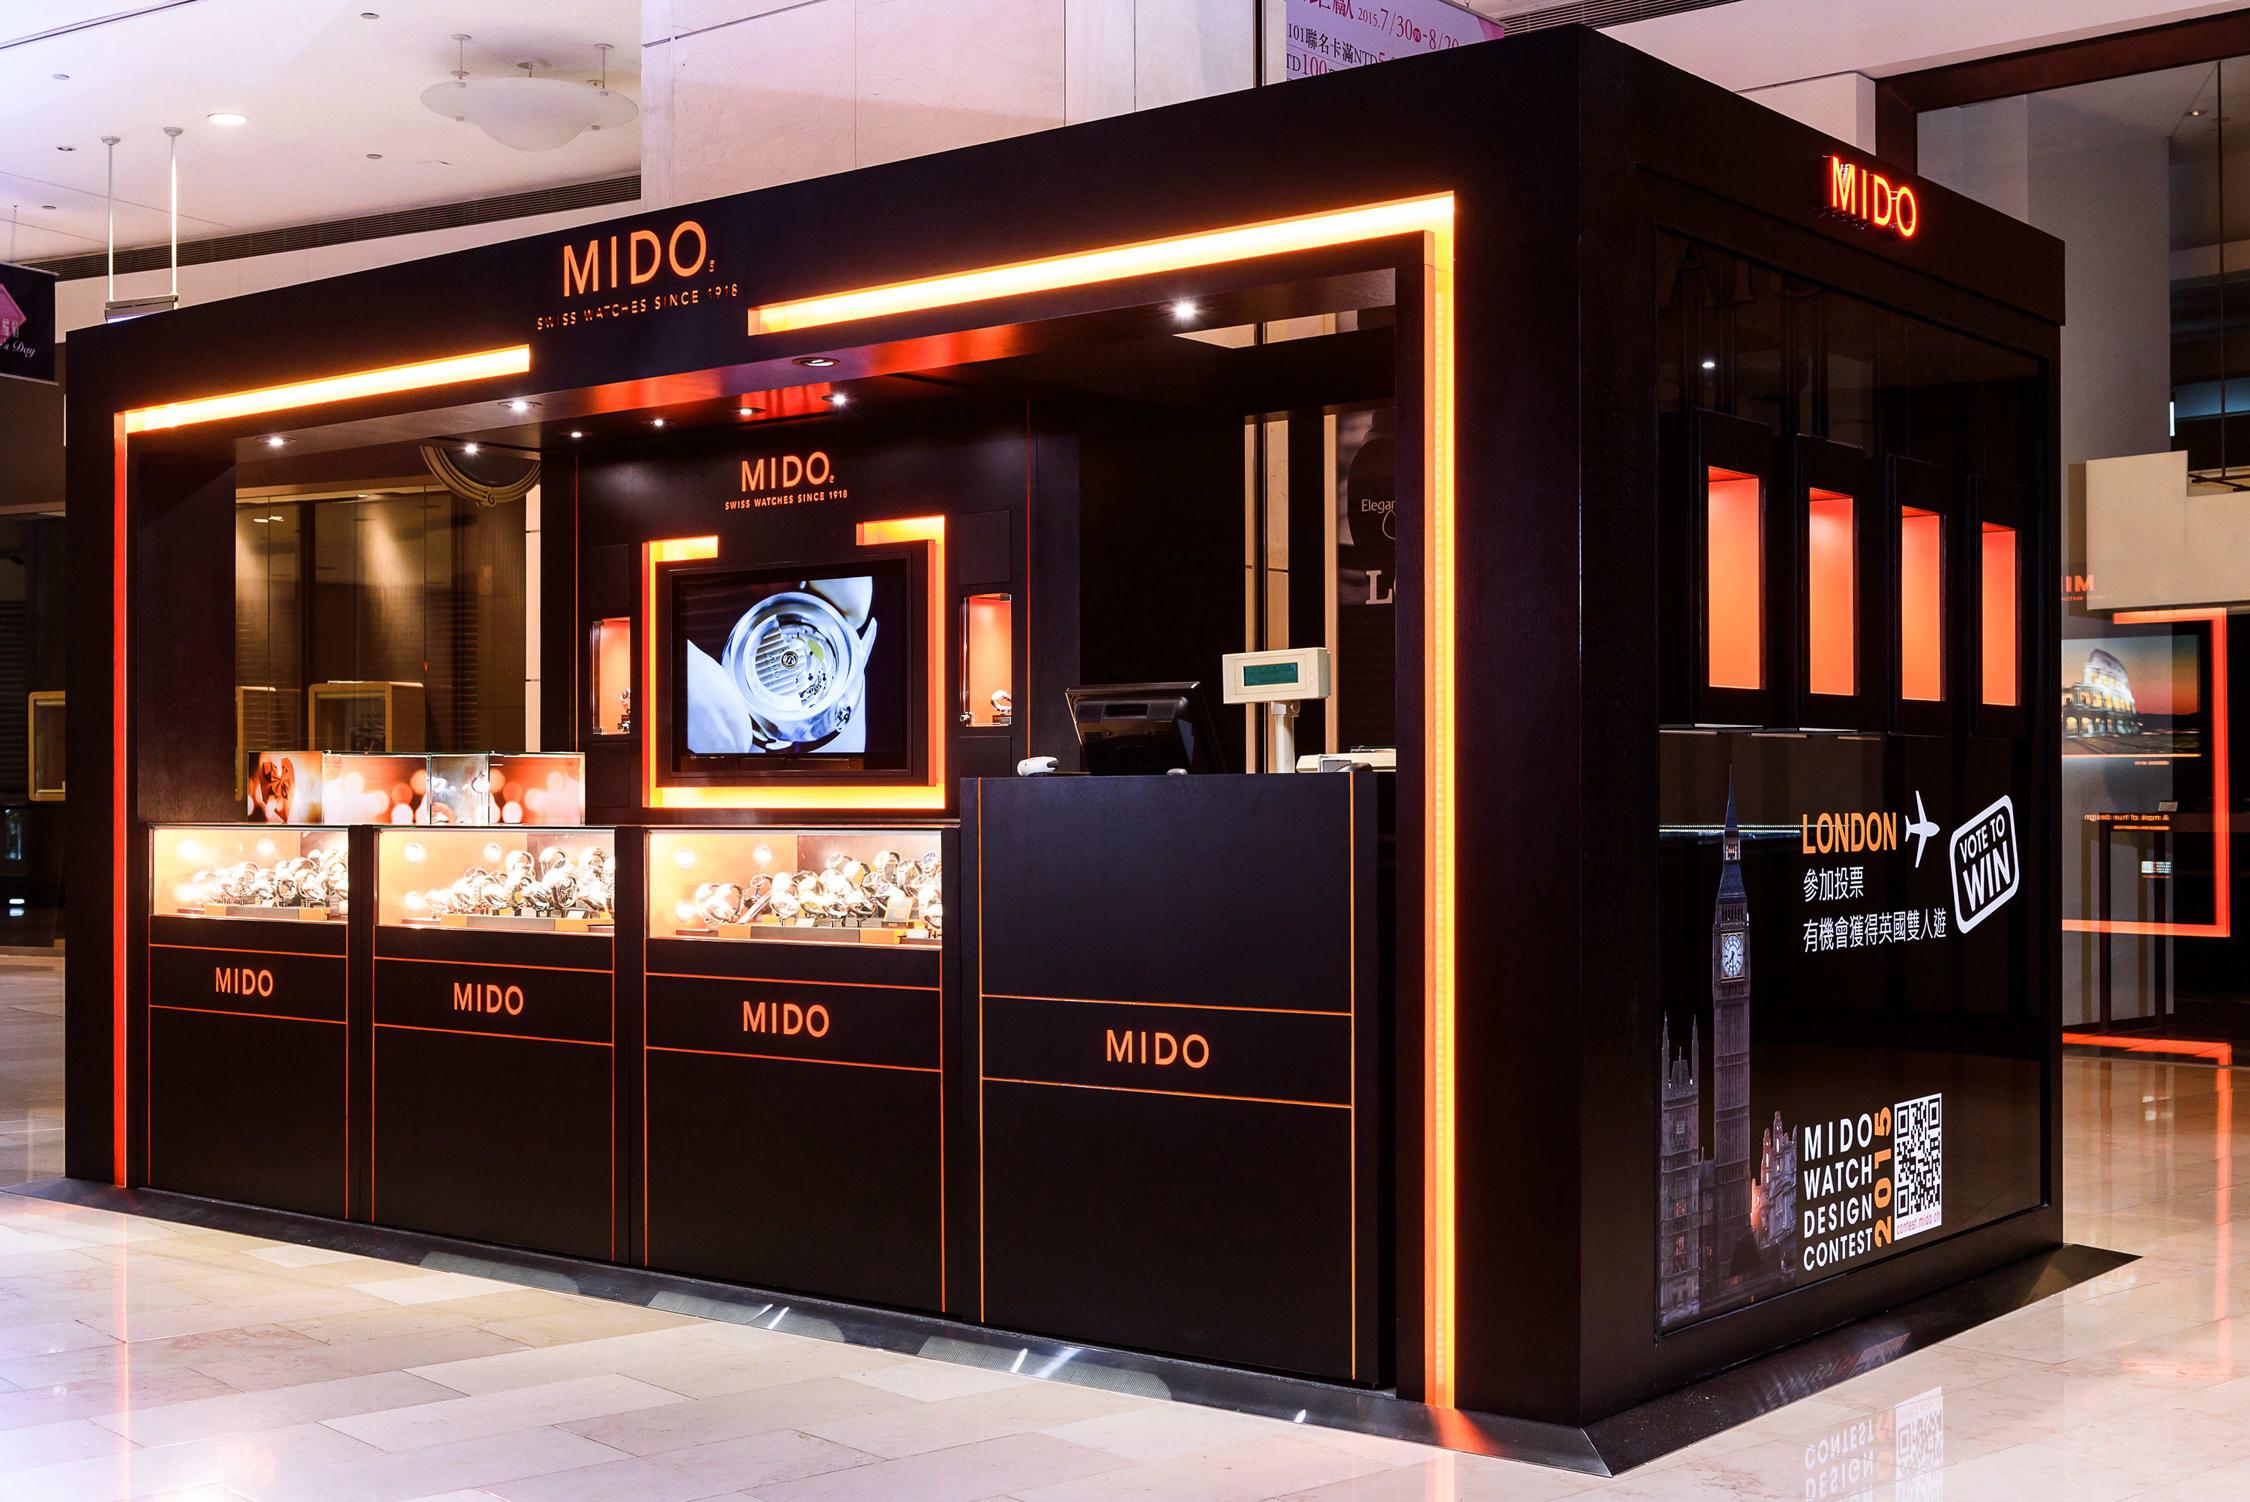 MIDO美度表台北101專賣店的右側,設置了四座代表不同系列的懸吊櫃,